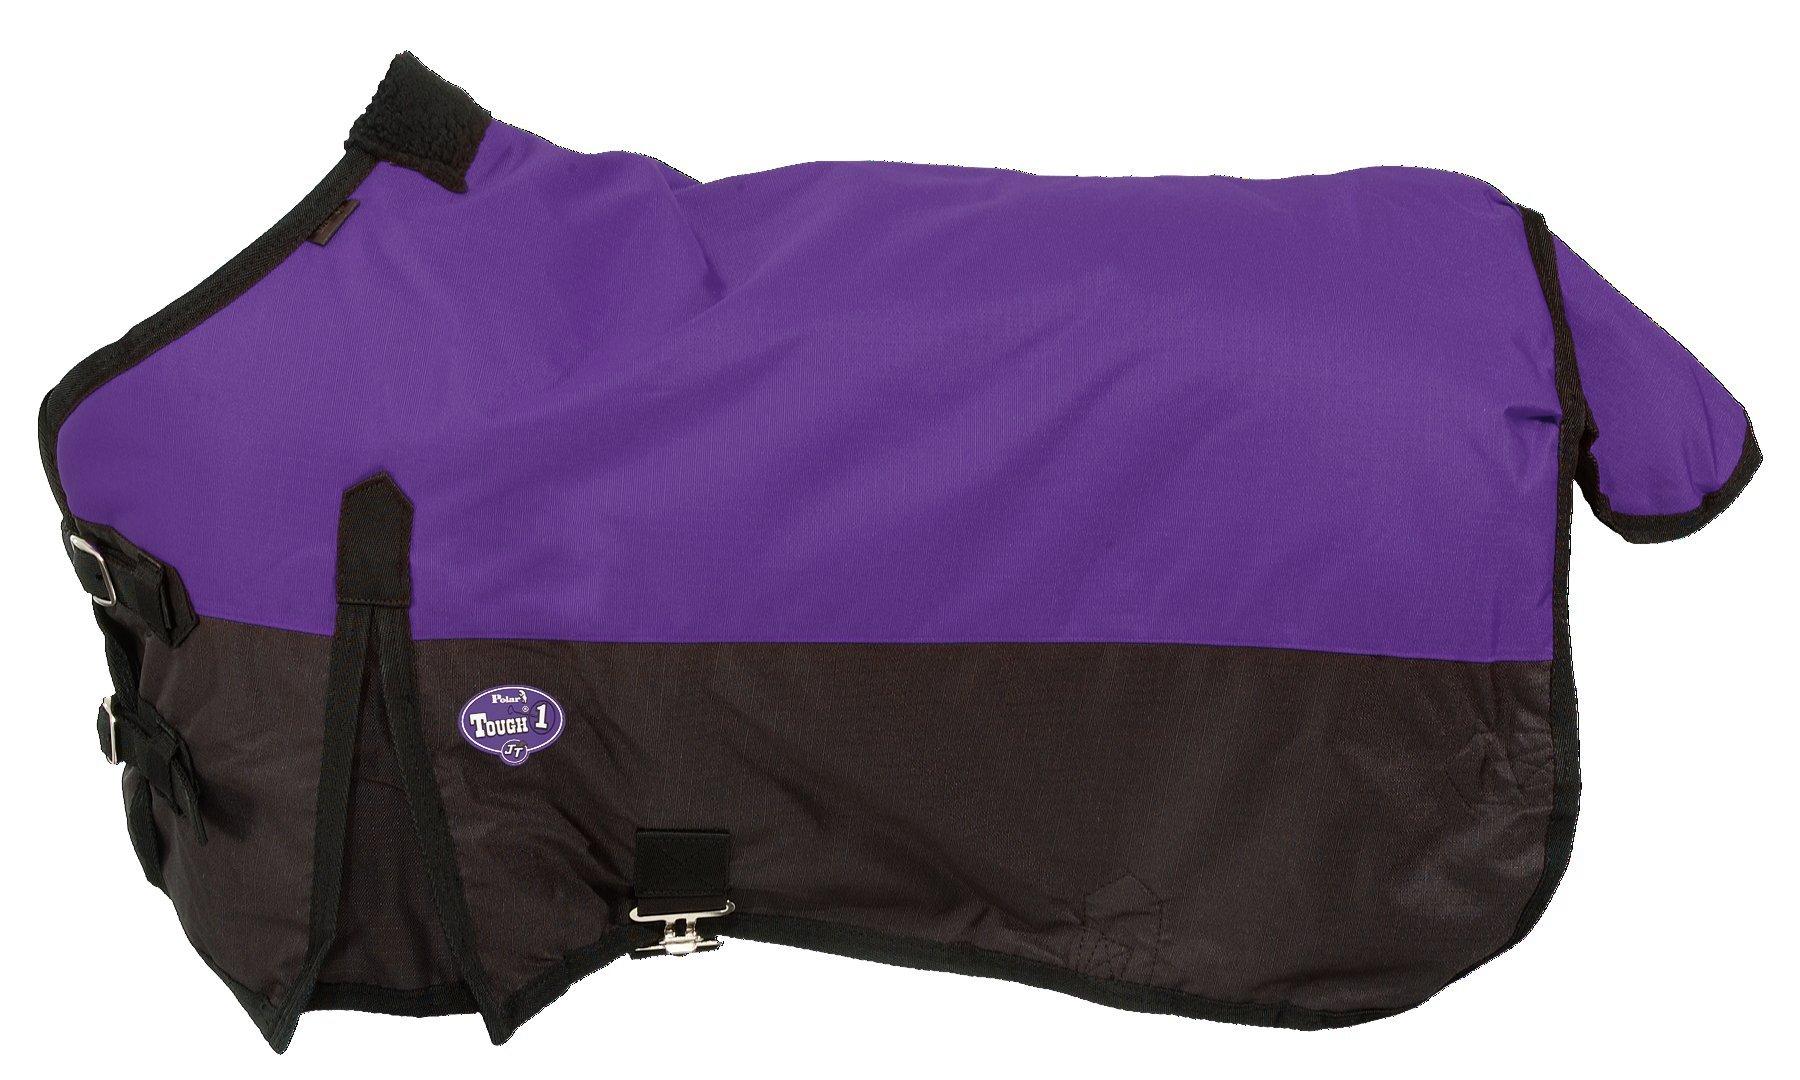 Tough 1 600D Waterproof Poly Miniature Turnout Blanket, Purple, 44''